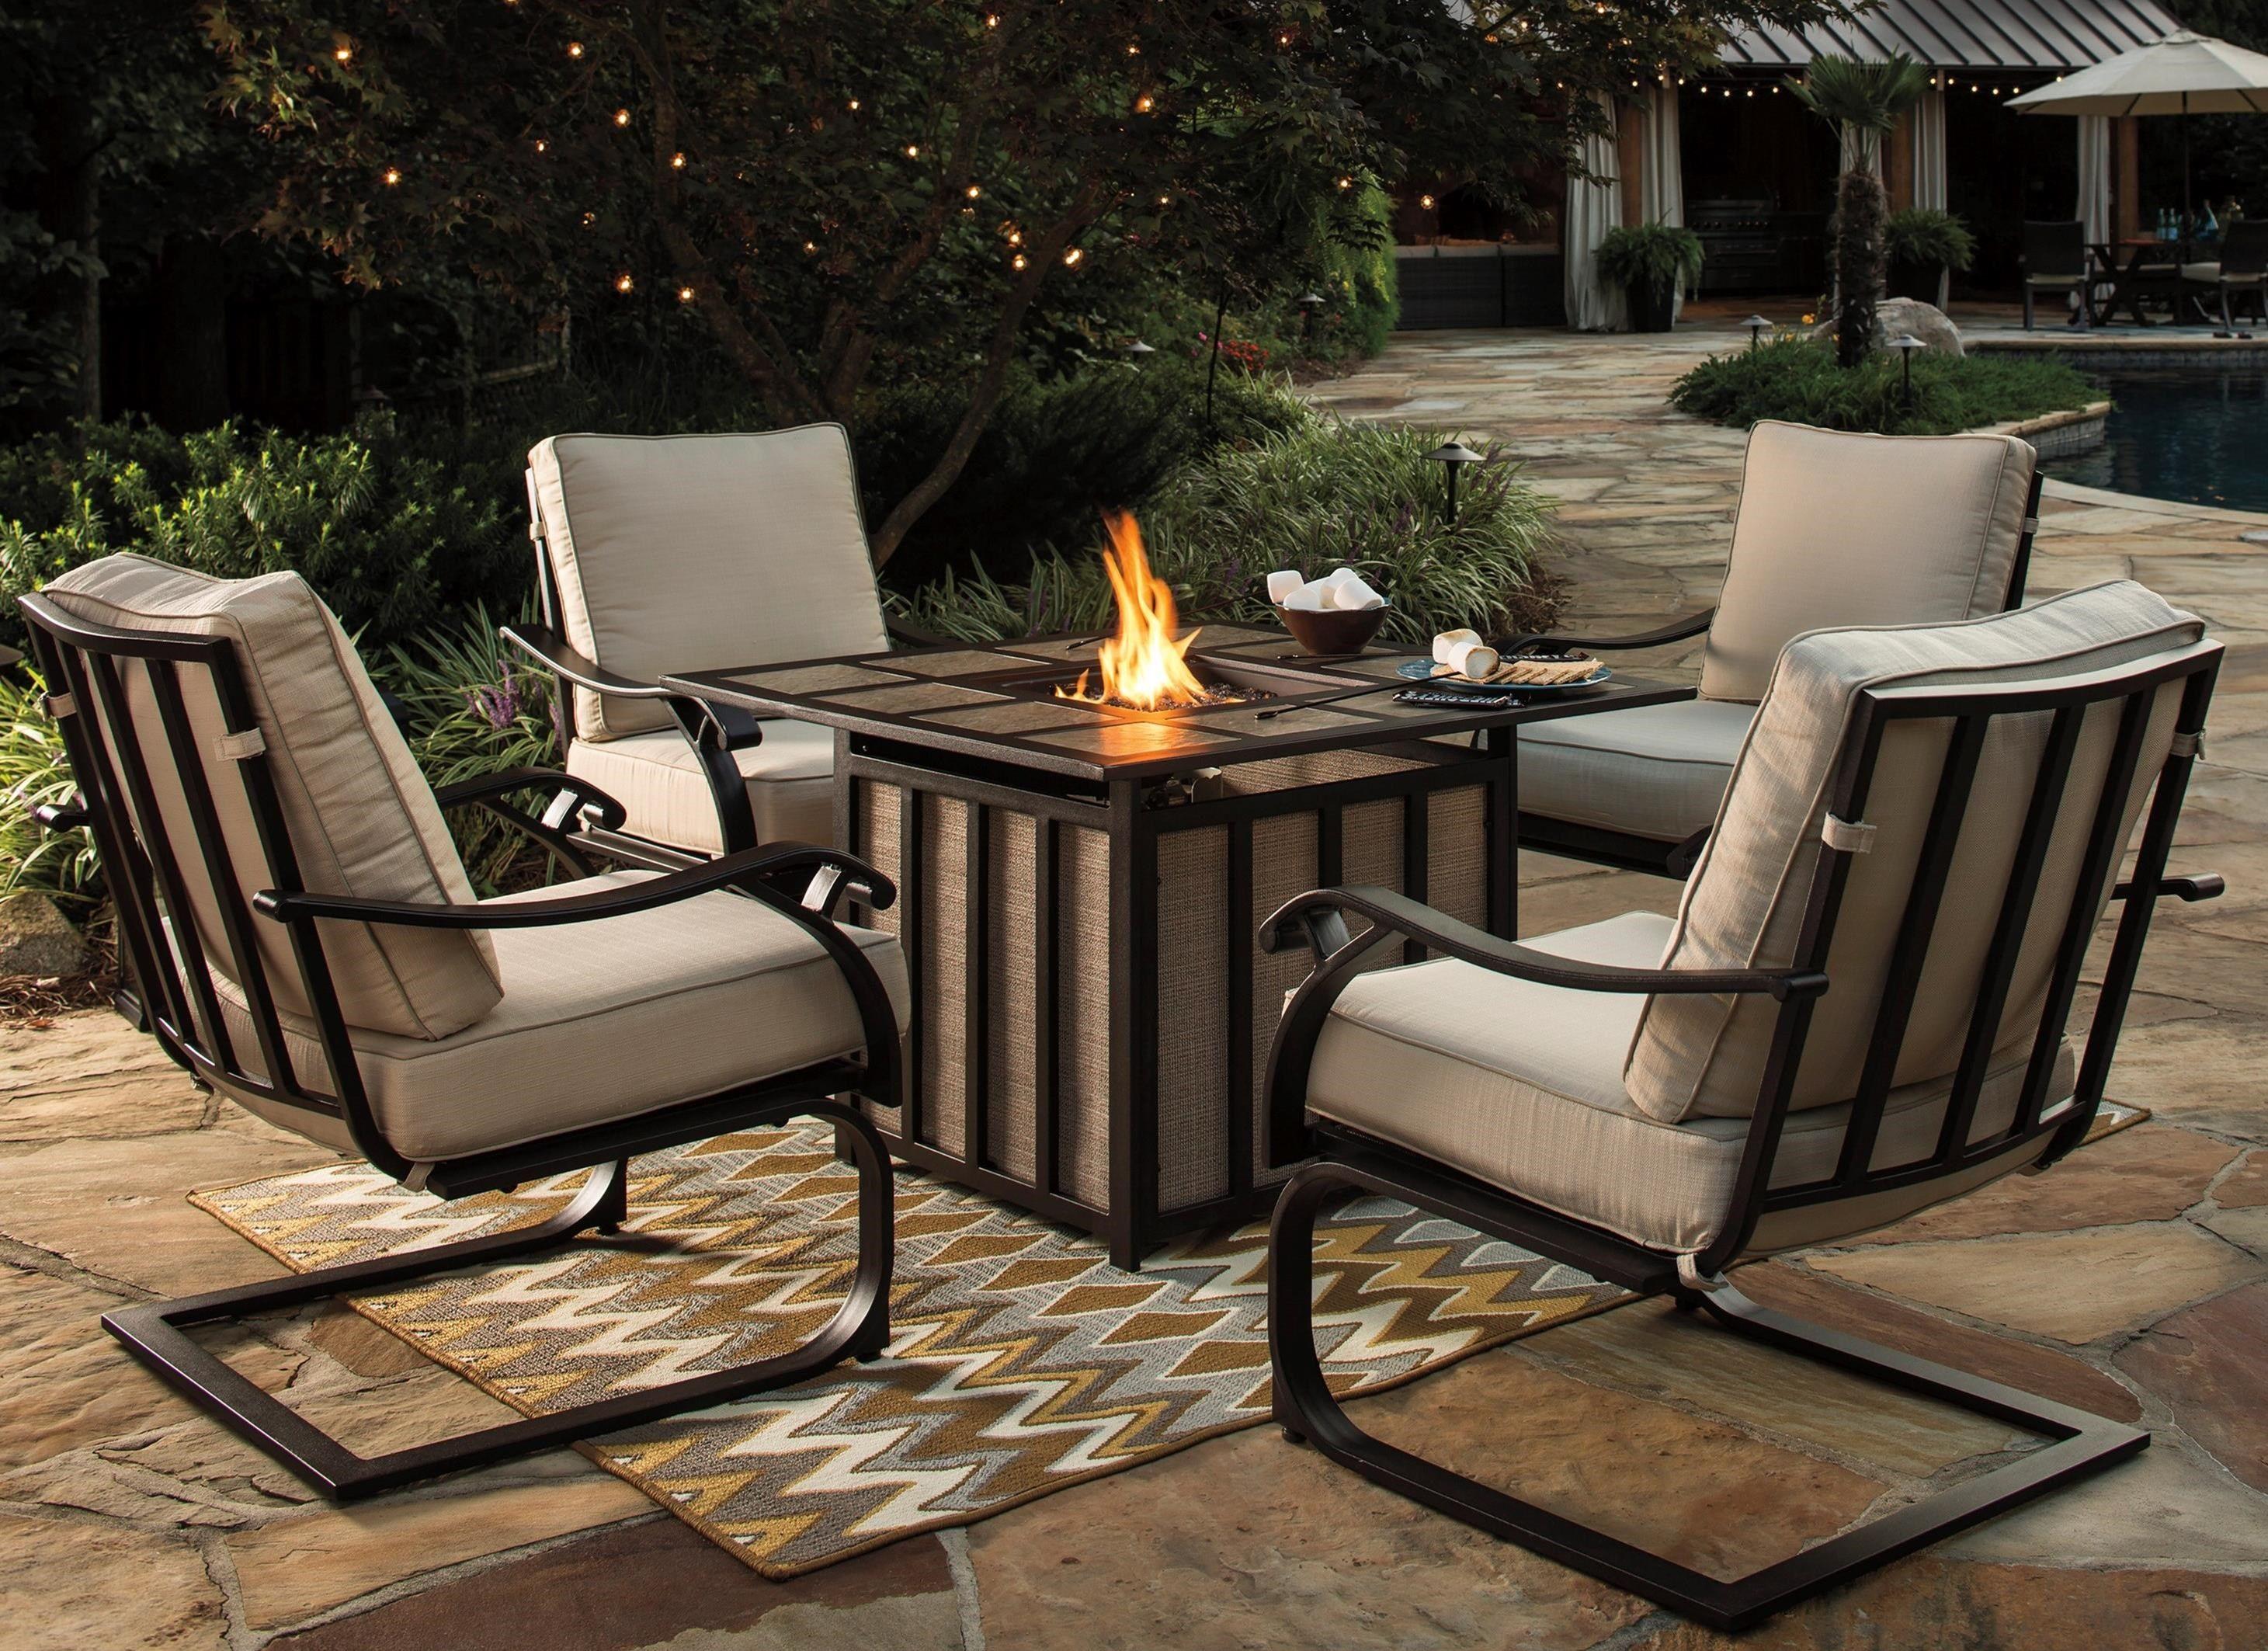 Simplydiscountfurniture Staywarm Staycomfy Furniture Firepit